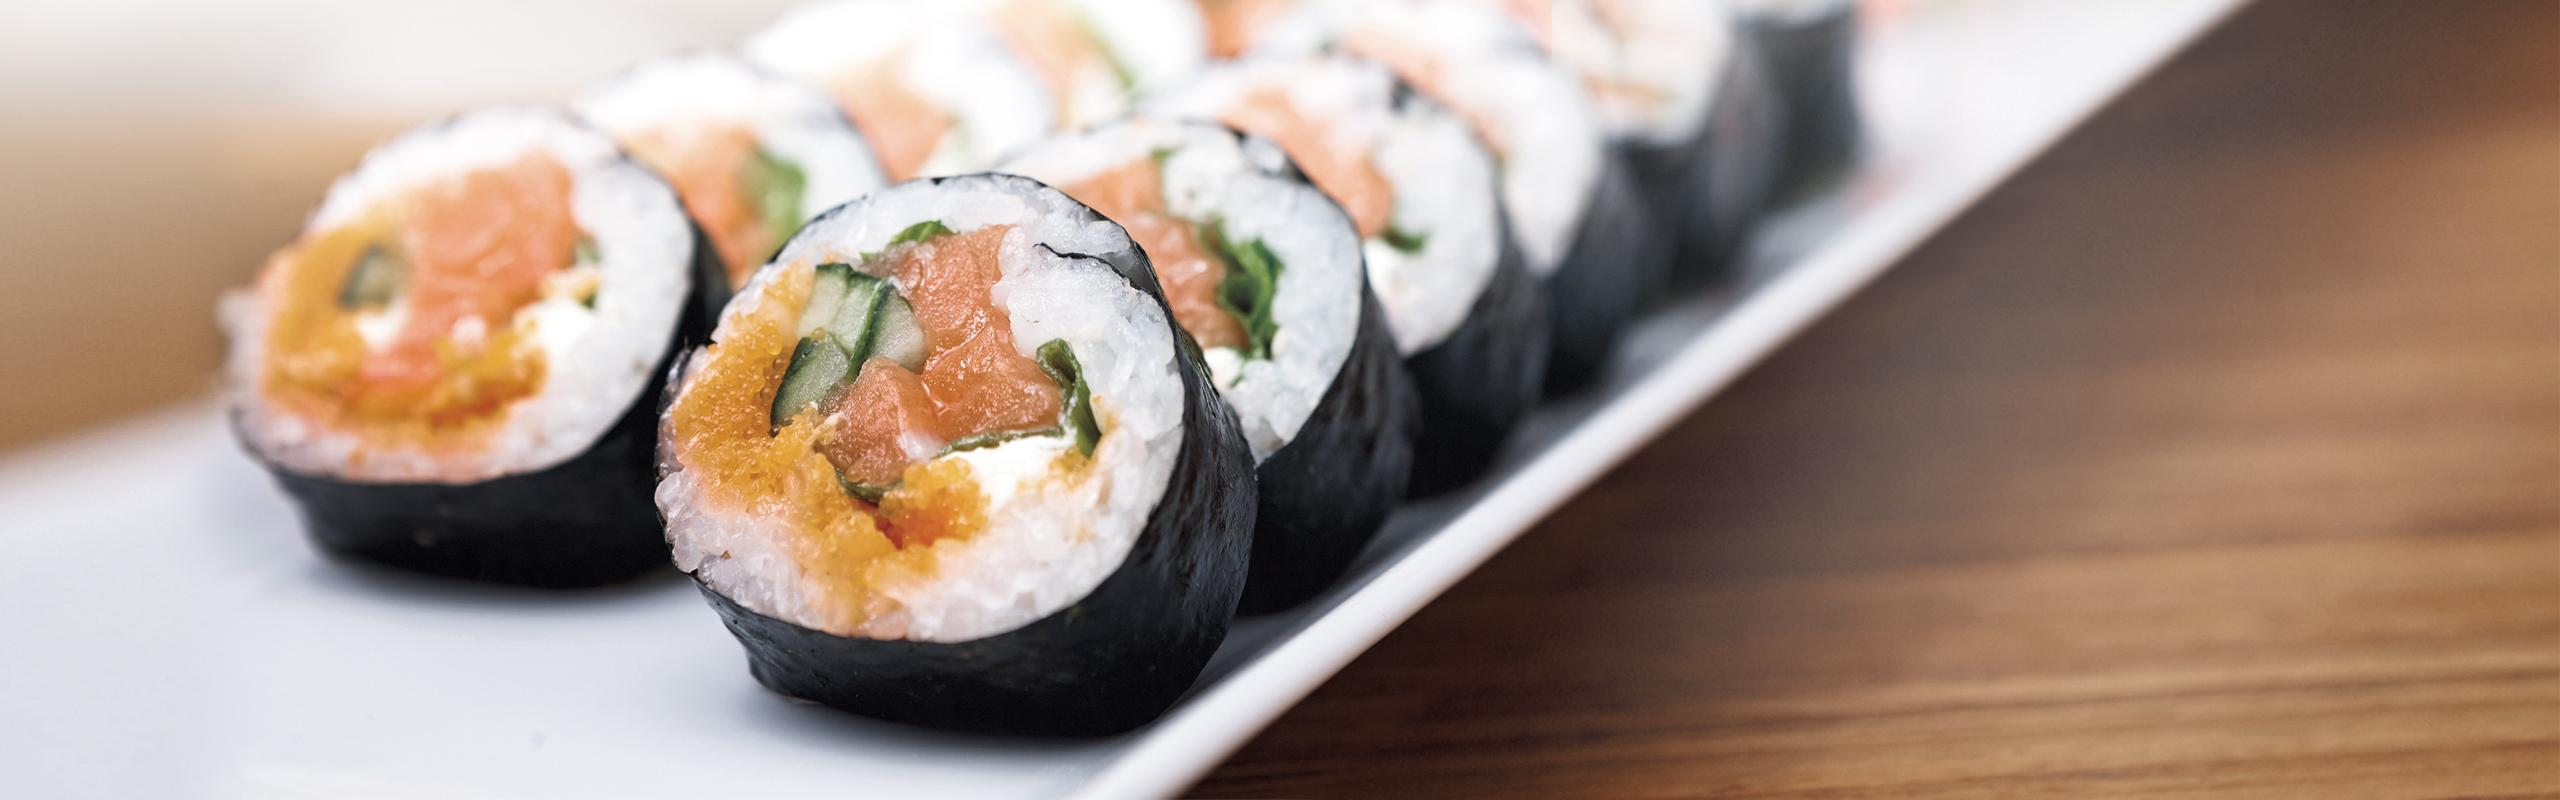 BRITA toprestaurant sushi